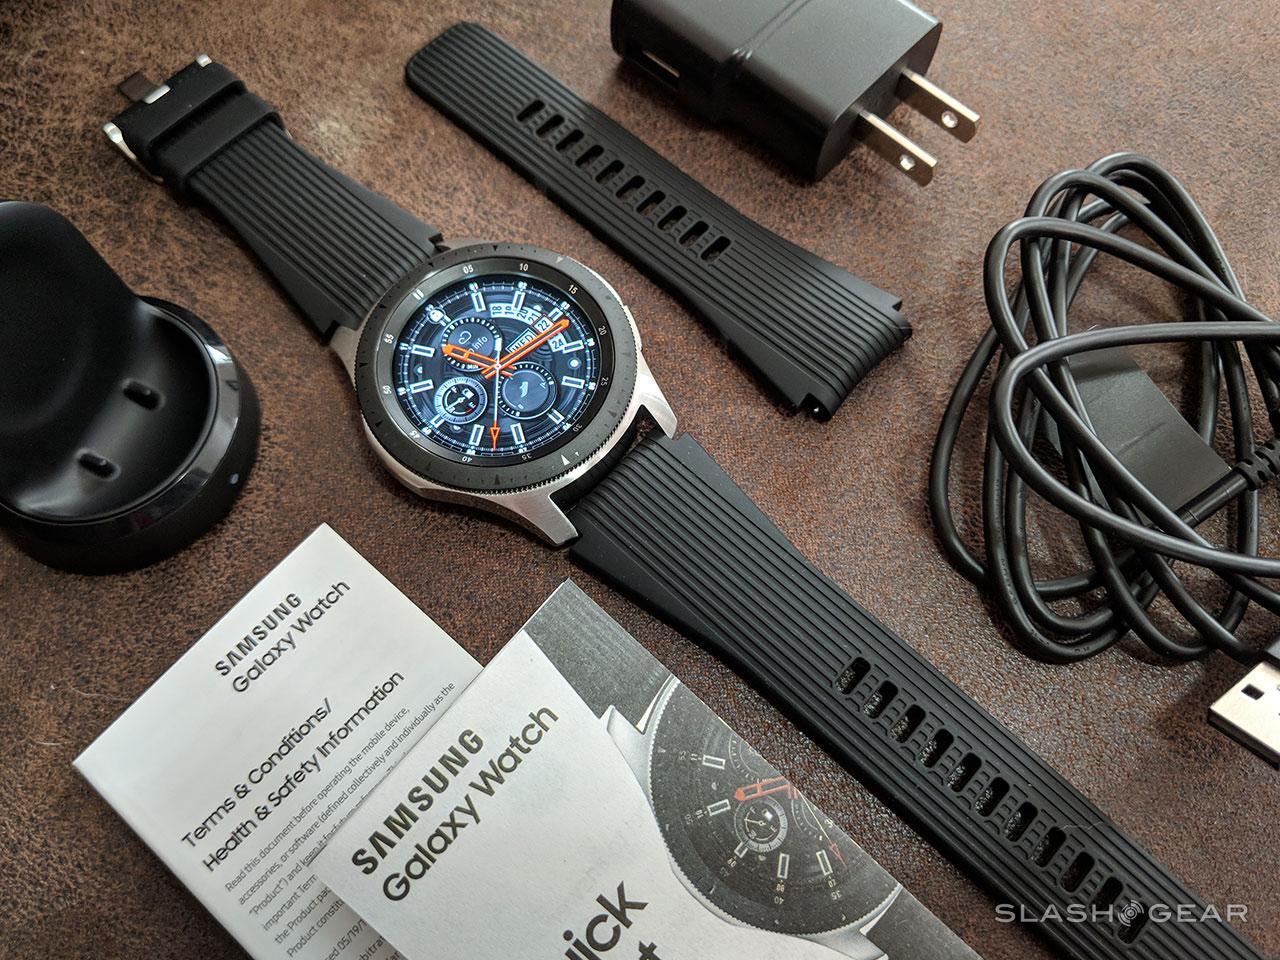 Samsung Galaxy Note 9 And Galaxy Watch On Sale Now Hands On Judgement Slashgear